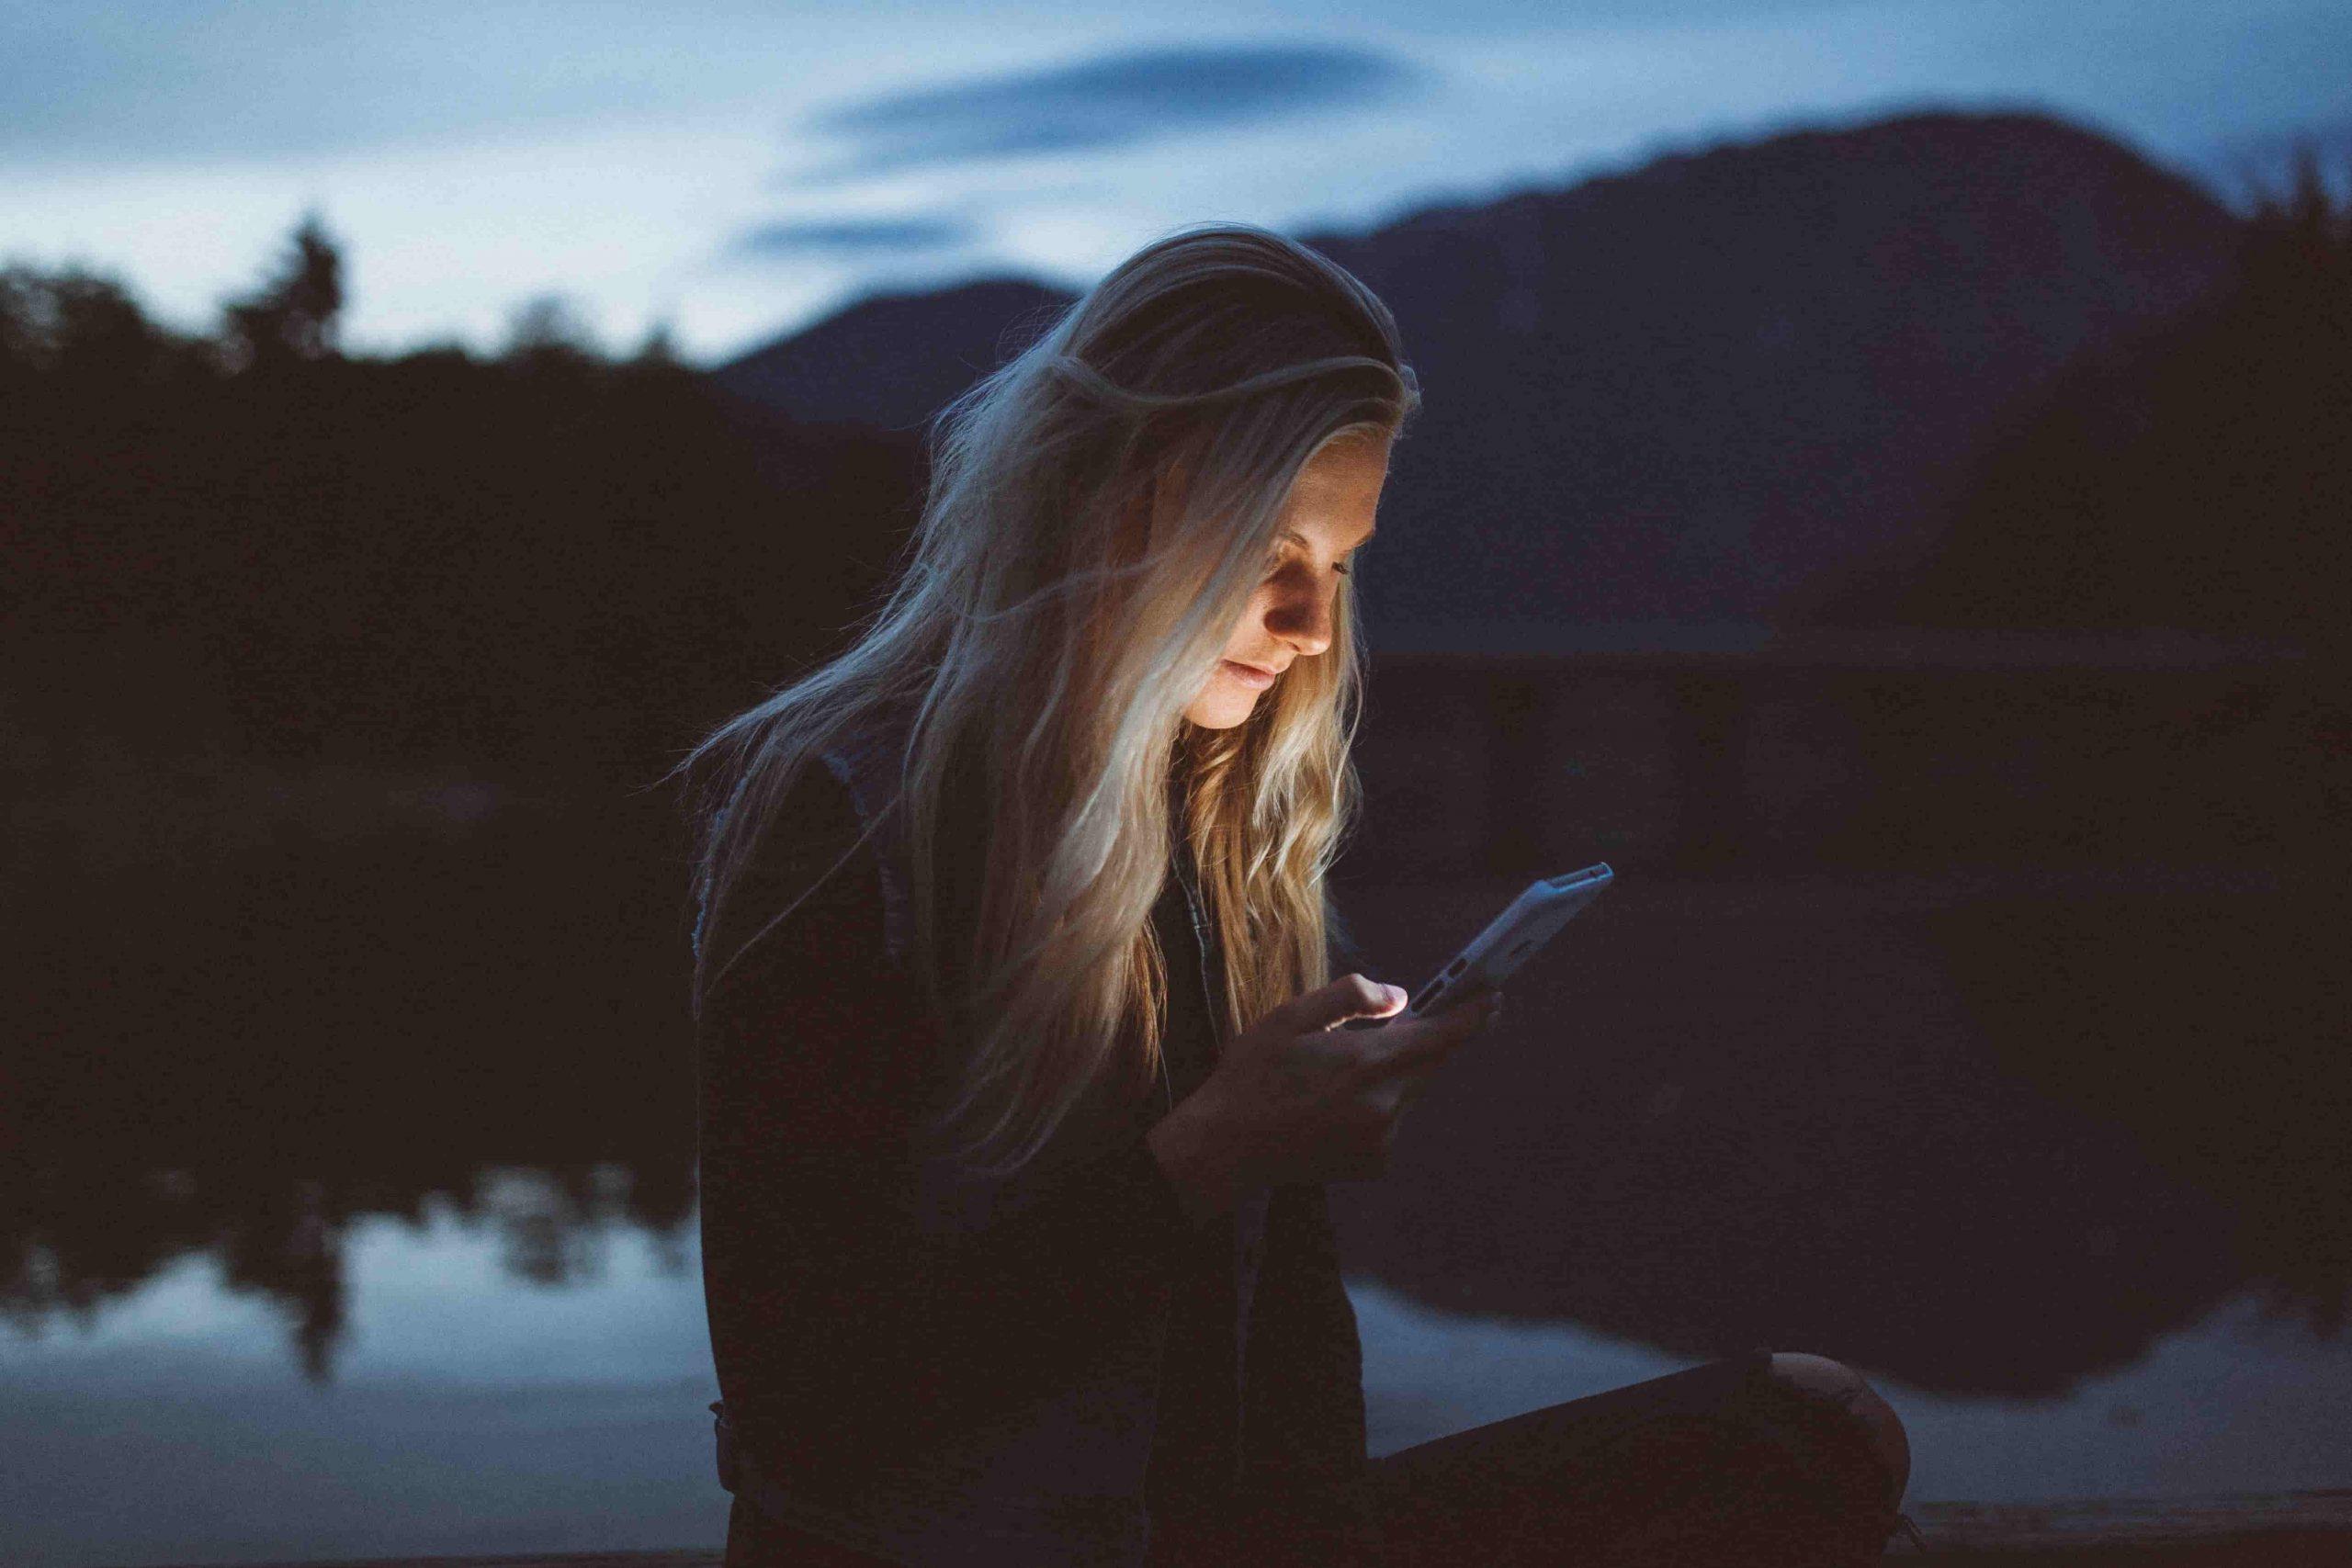 Social Media Effects Mental Health